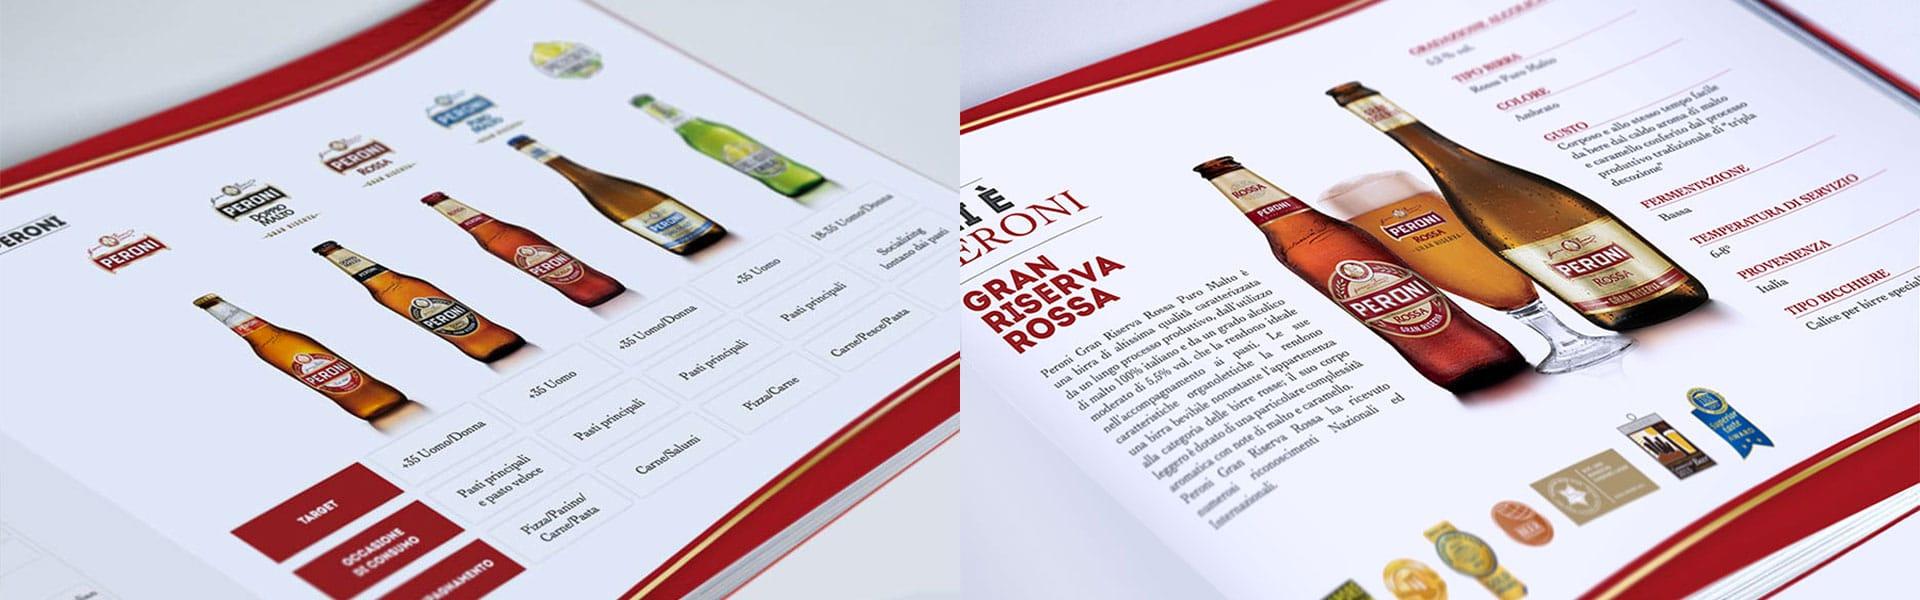 Peroni - Brandbook 1